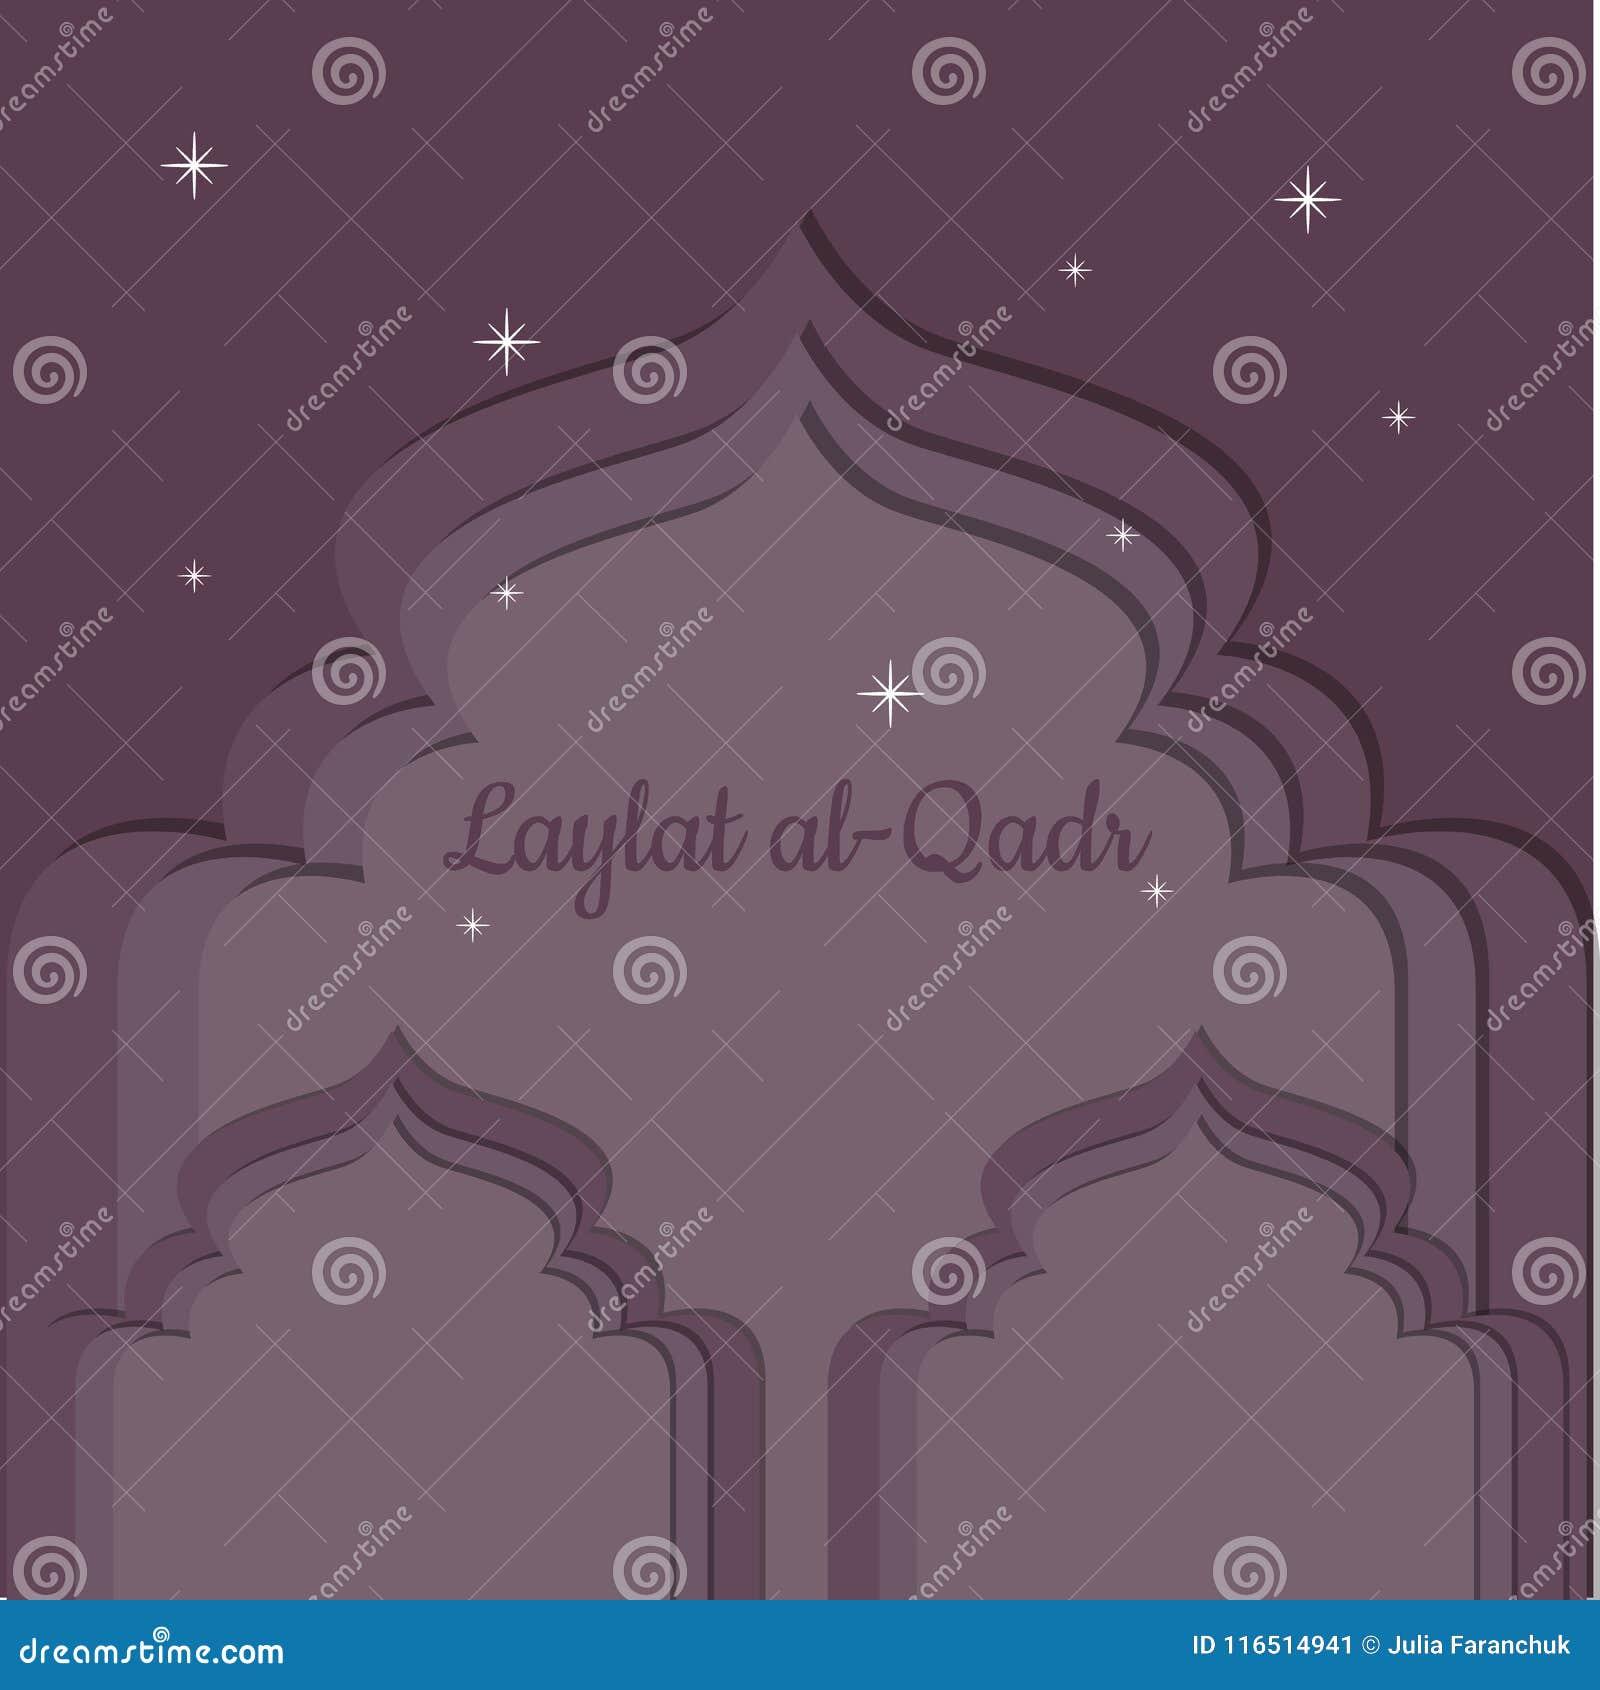 Laylat Al Qadr Islamic Religion Holiday Symbolic Silhouette Of The